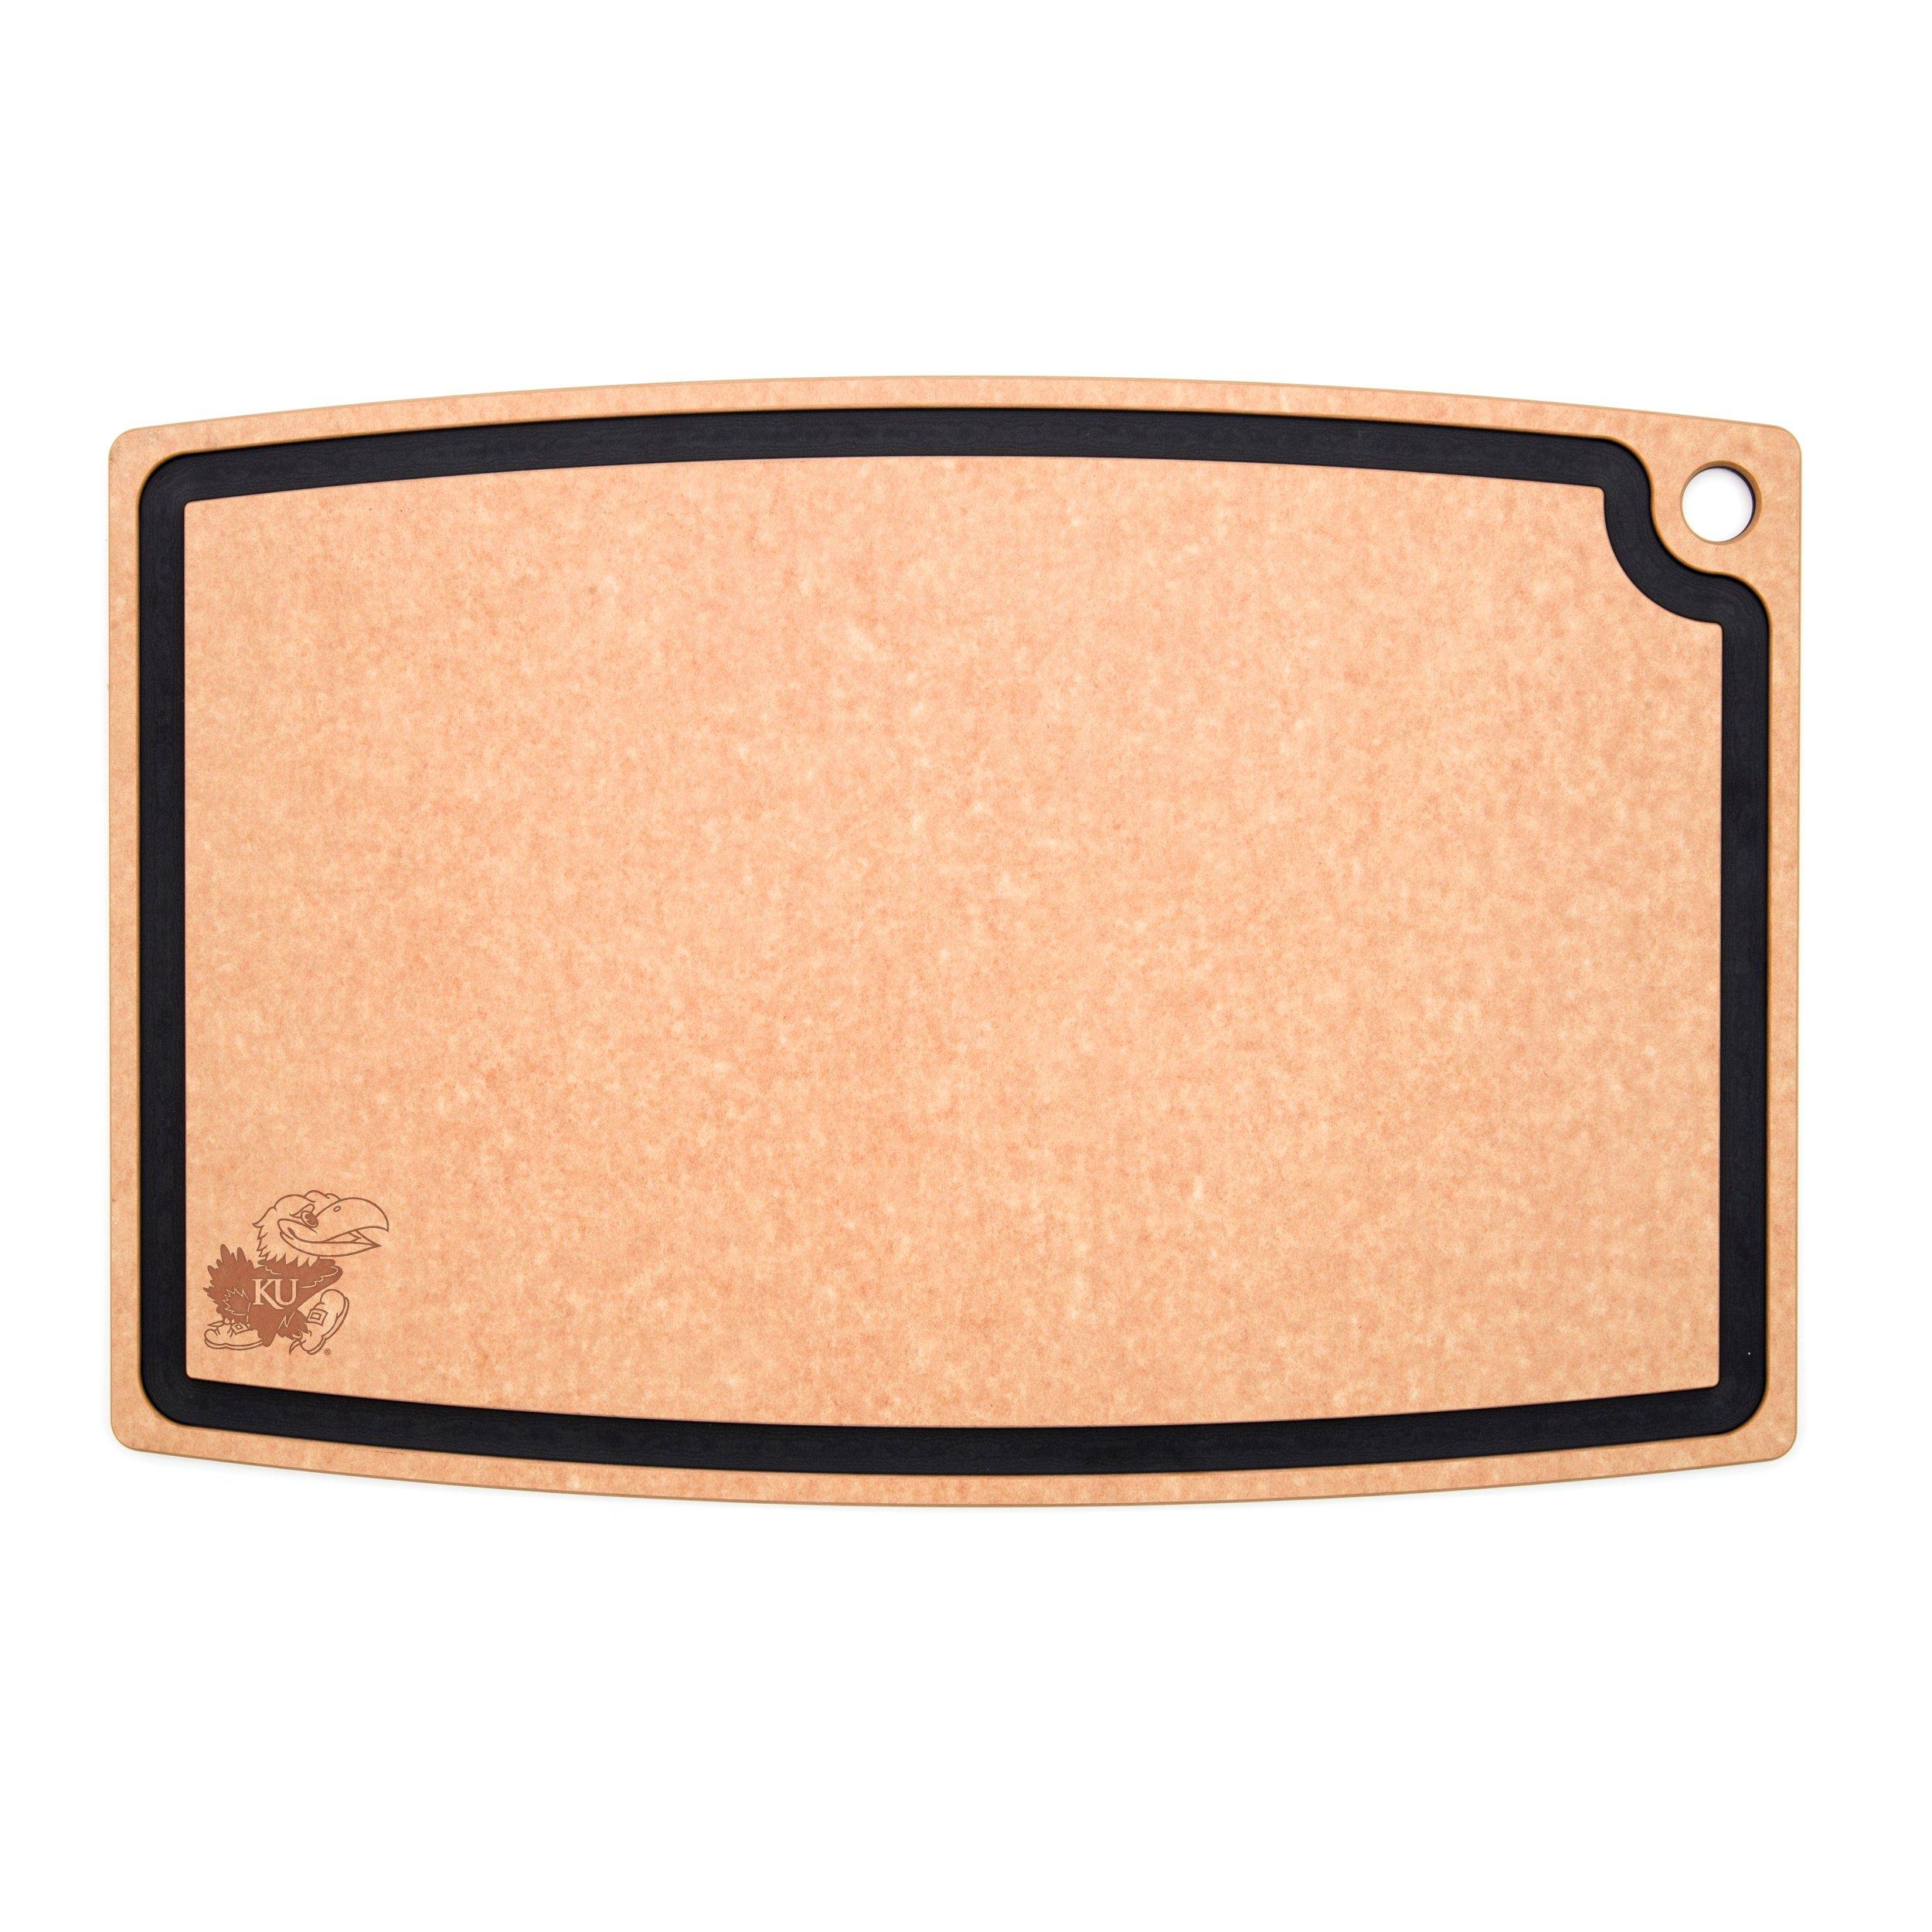 Epicurean C006-27180102-UKS University of Kansas Jayhawks Carving/Bbq Board, 27'' x 18'', Natural/Slate